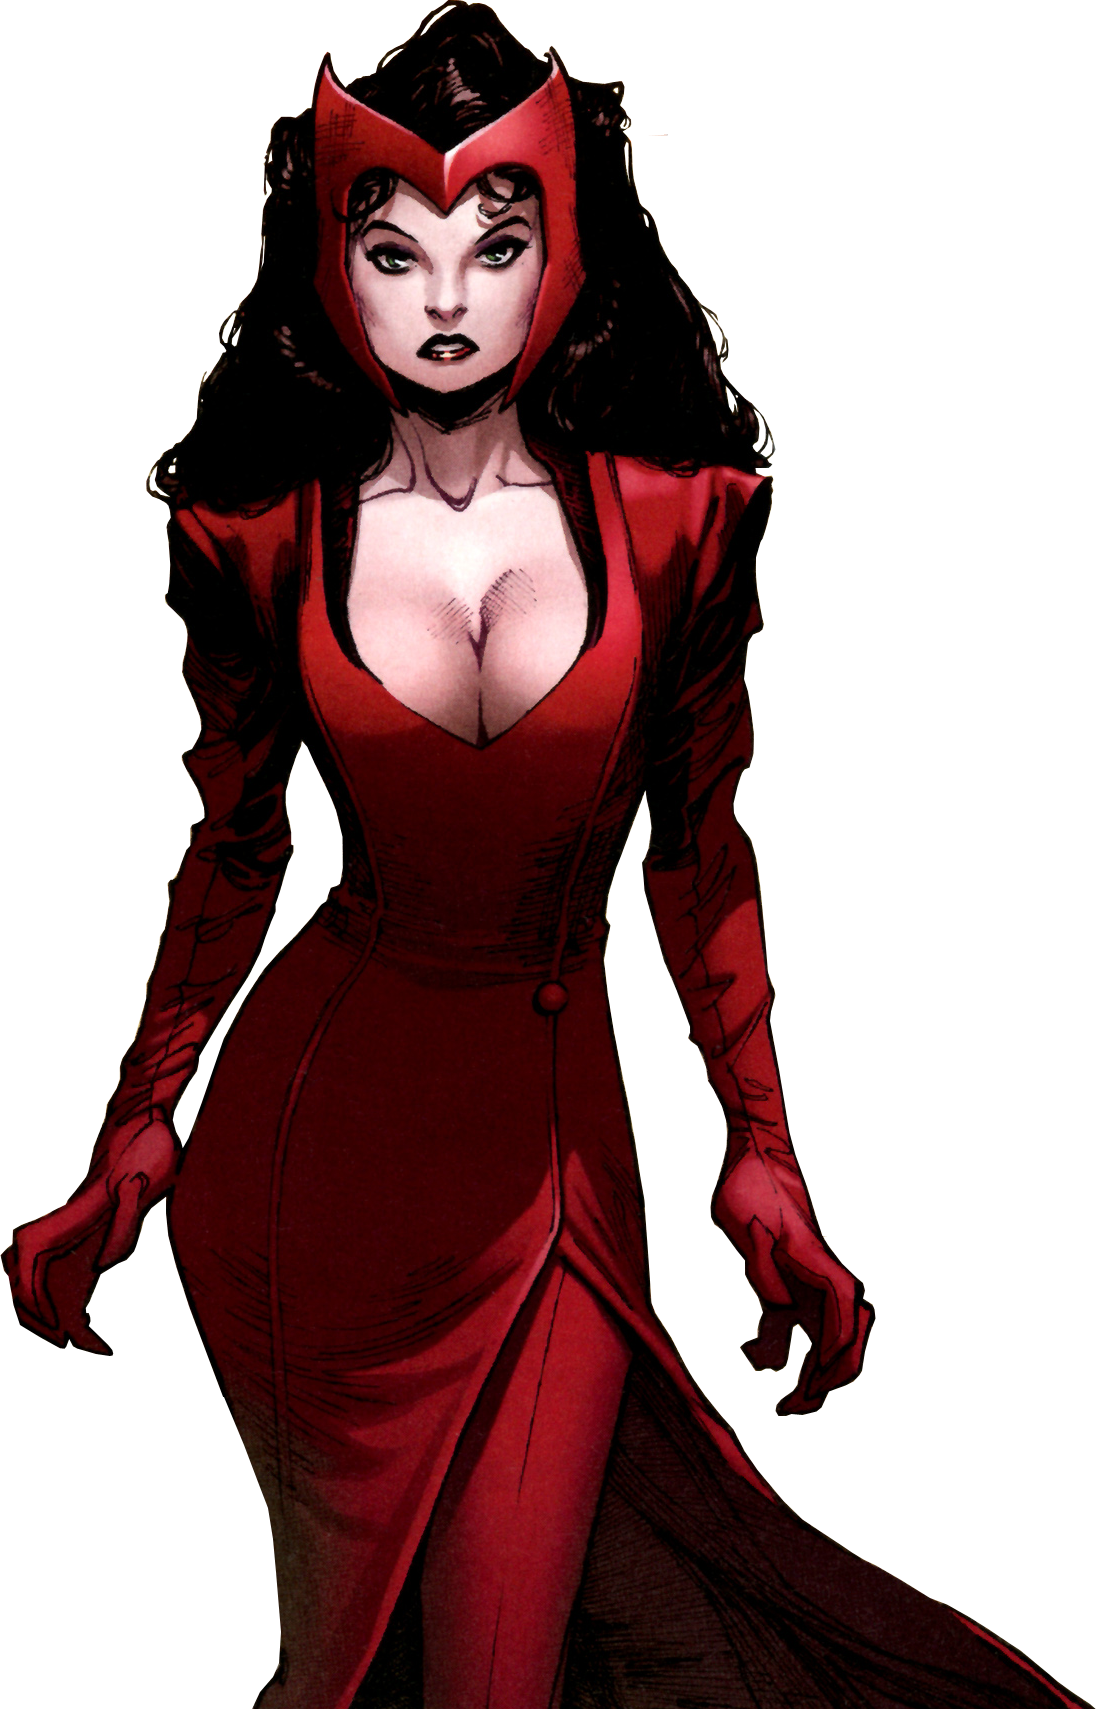 http://static2.wikia.nocookie.net/__cb20130603011427/marvel/es/images/5/59/Wanda_Maximoff_(Tierra-616)_en_Uncanny_Avengers_Vol_1_1_Cubierta_Variante_cover.png